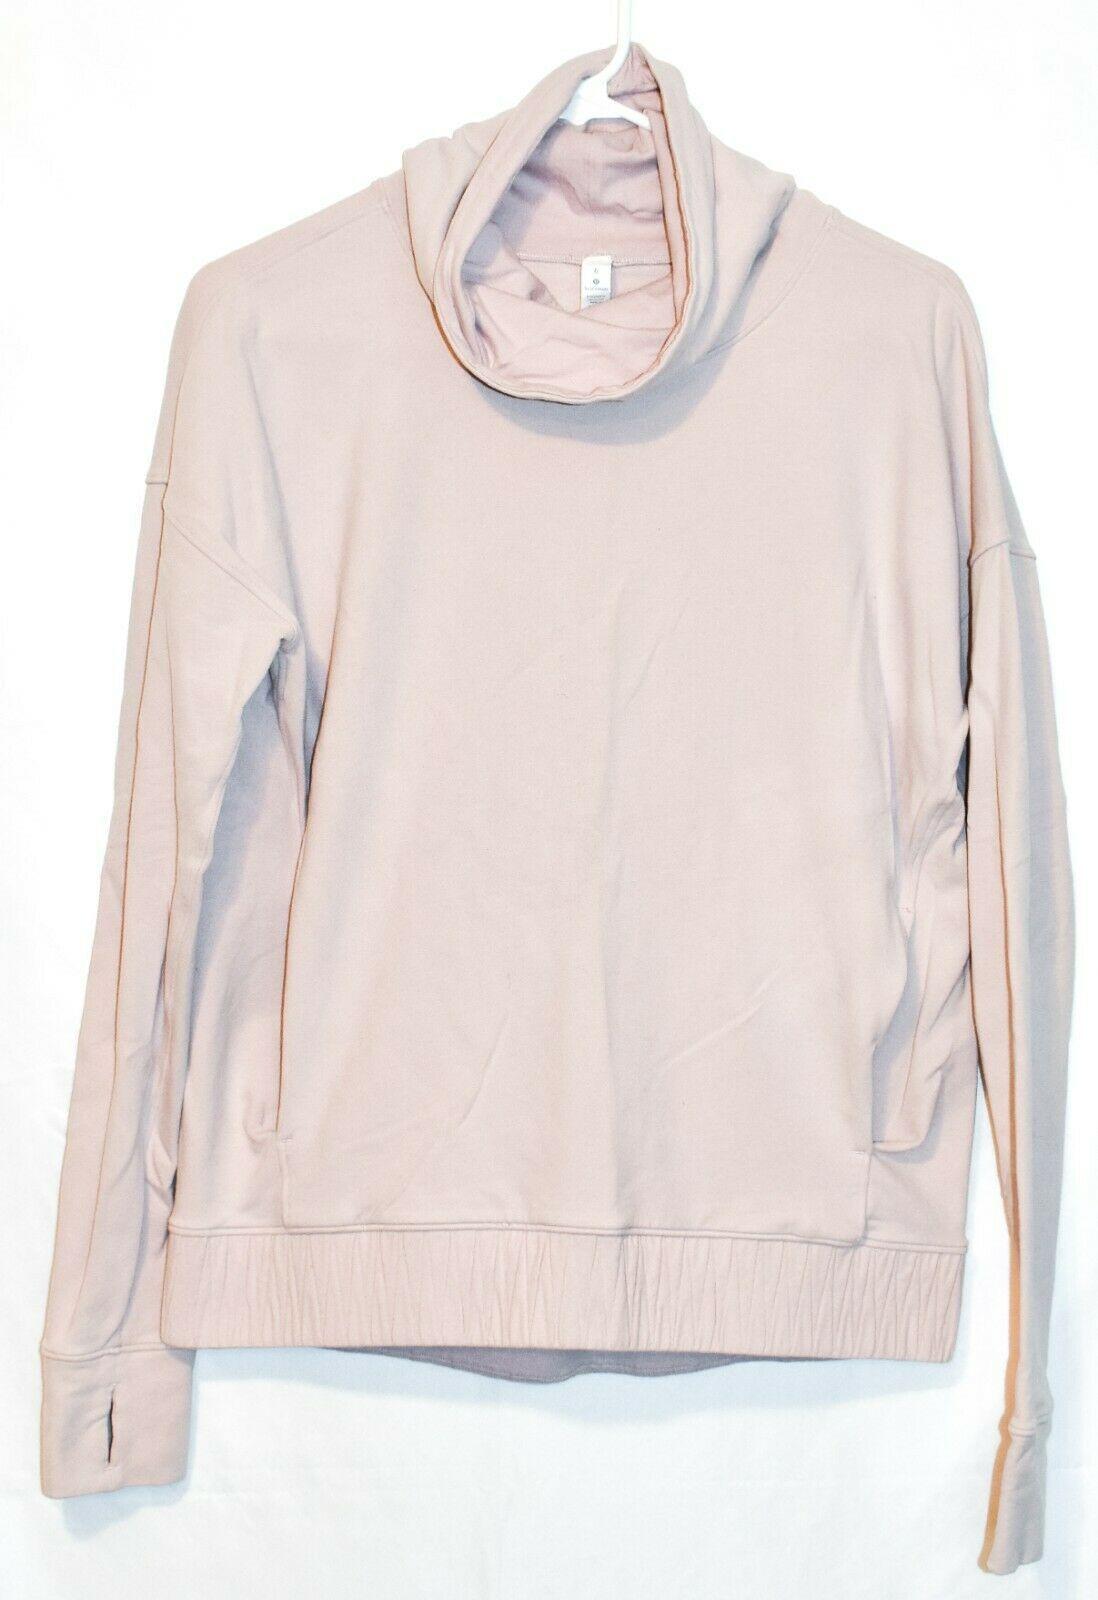 Lululemon Women's Porcelain Pink Stress Less Pullover Cowl Neck Turtleneck 6